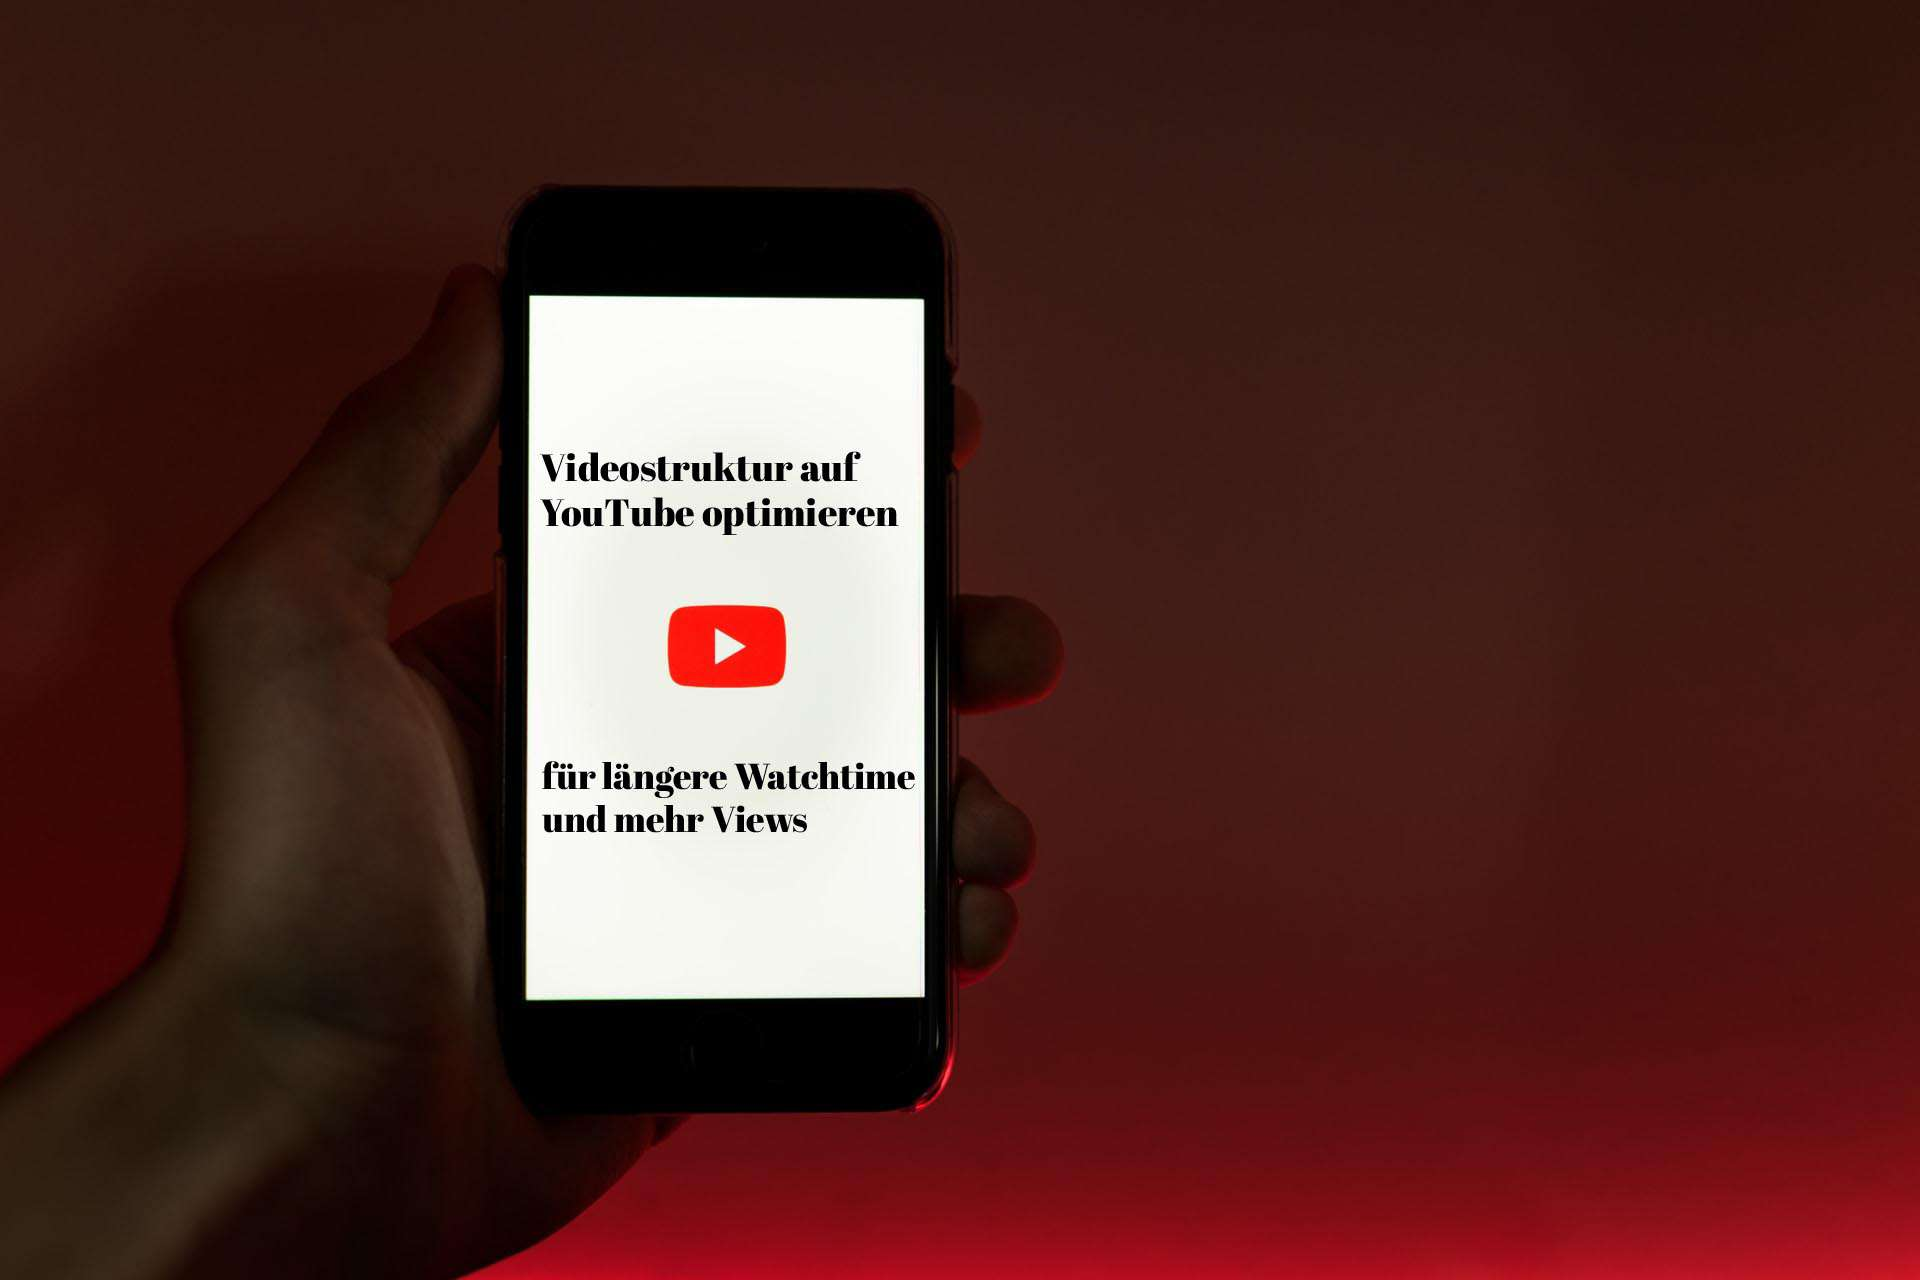 YouTube Videostruktur